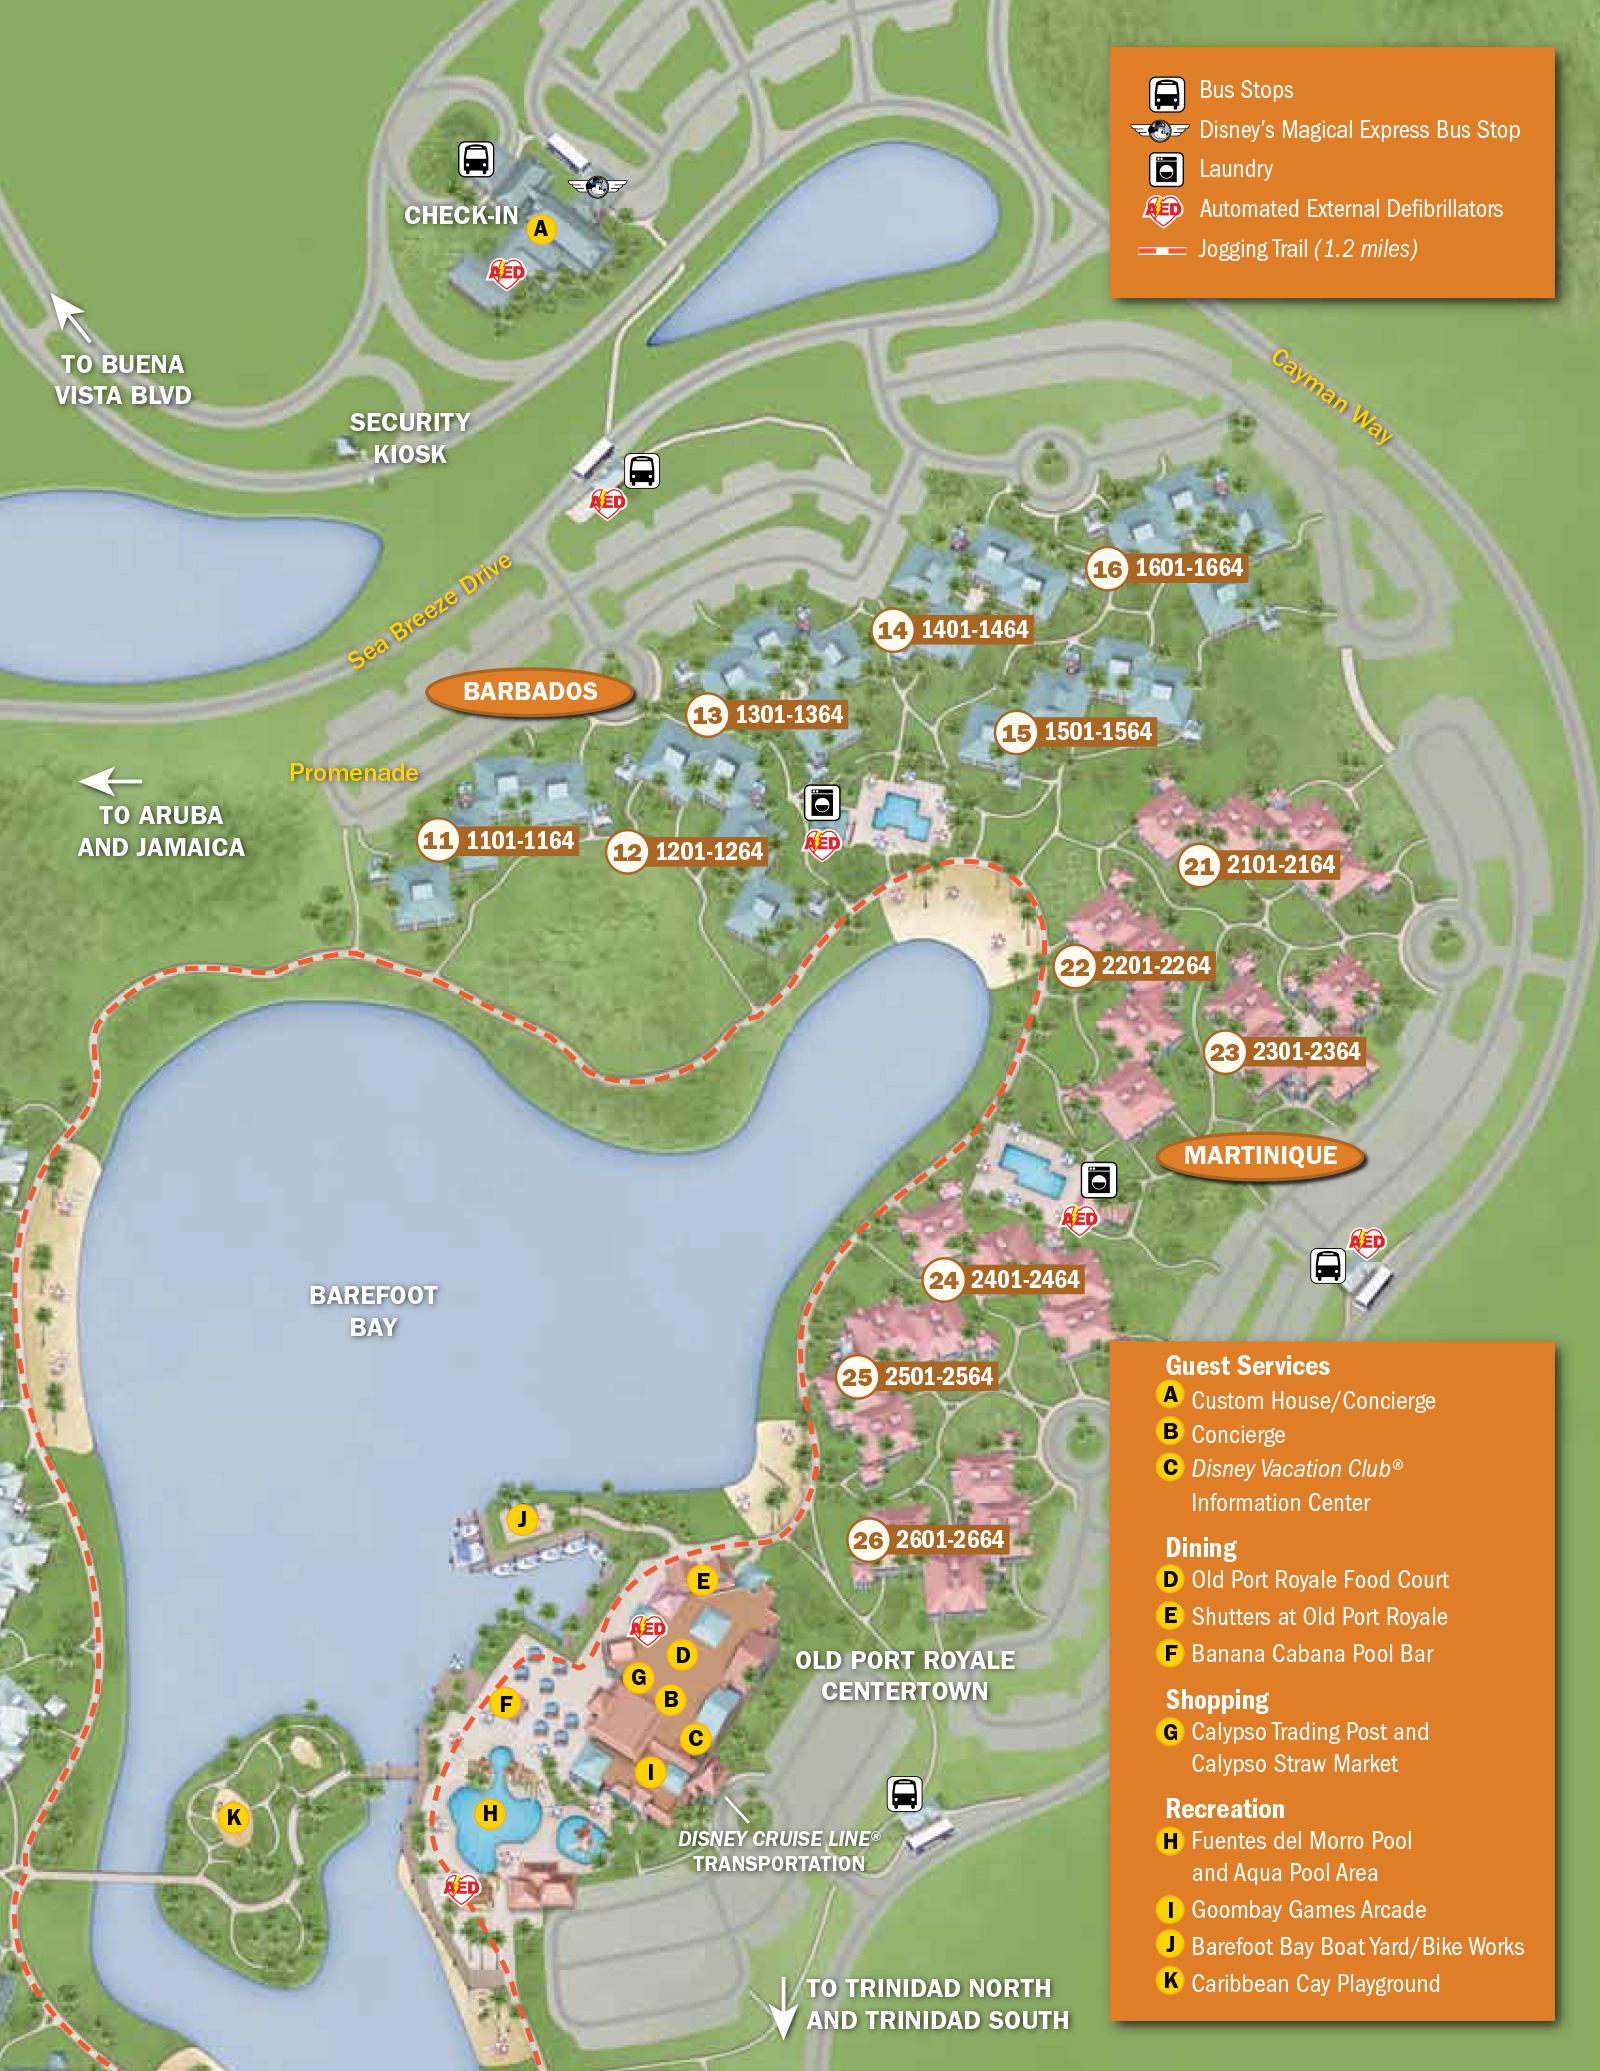 2013 Caribbean Beach Resort guide map Photo 4 of 6